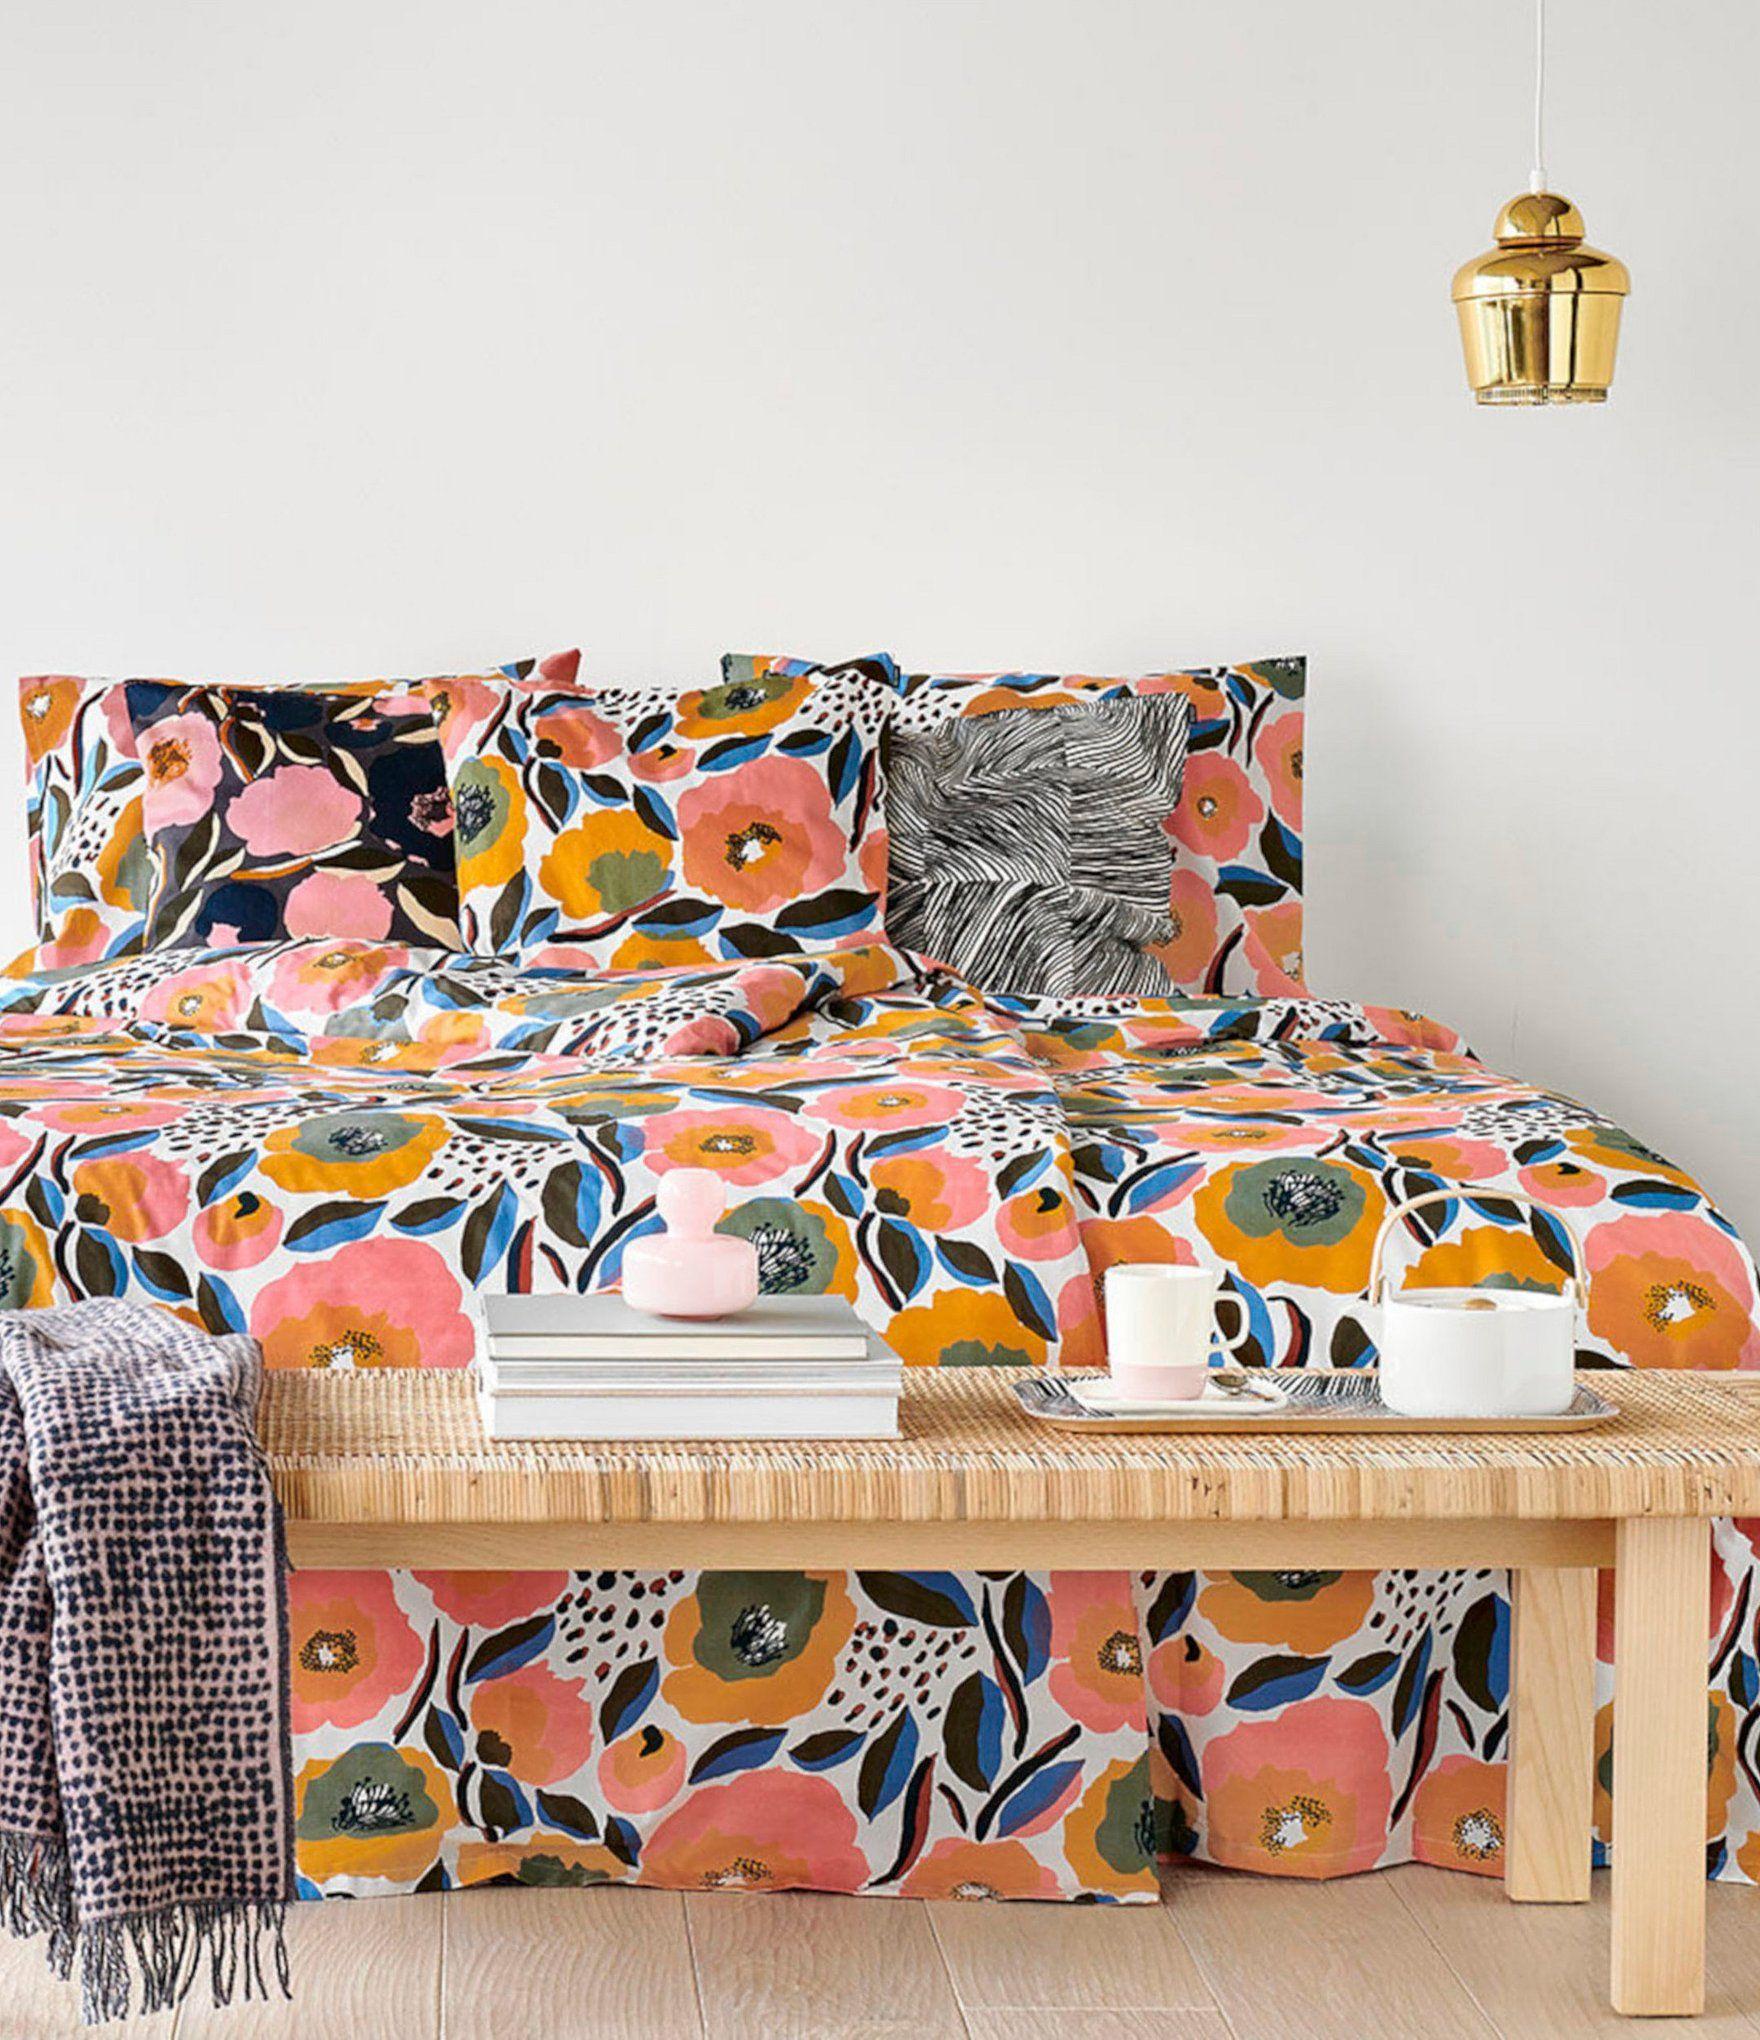 Marimekko Rosarium Floral Mini Comforter Set - Open/Medium Pink King